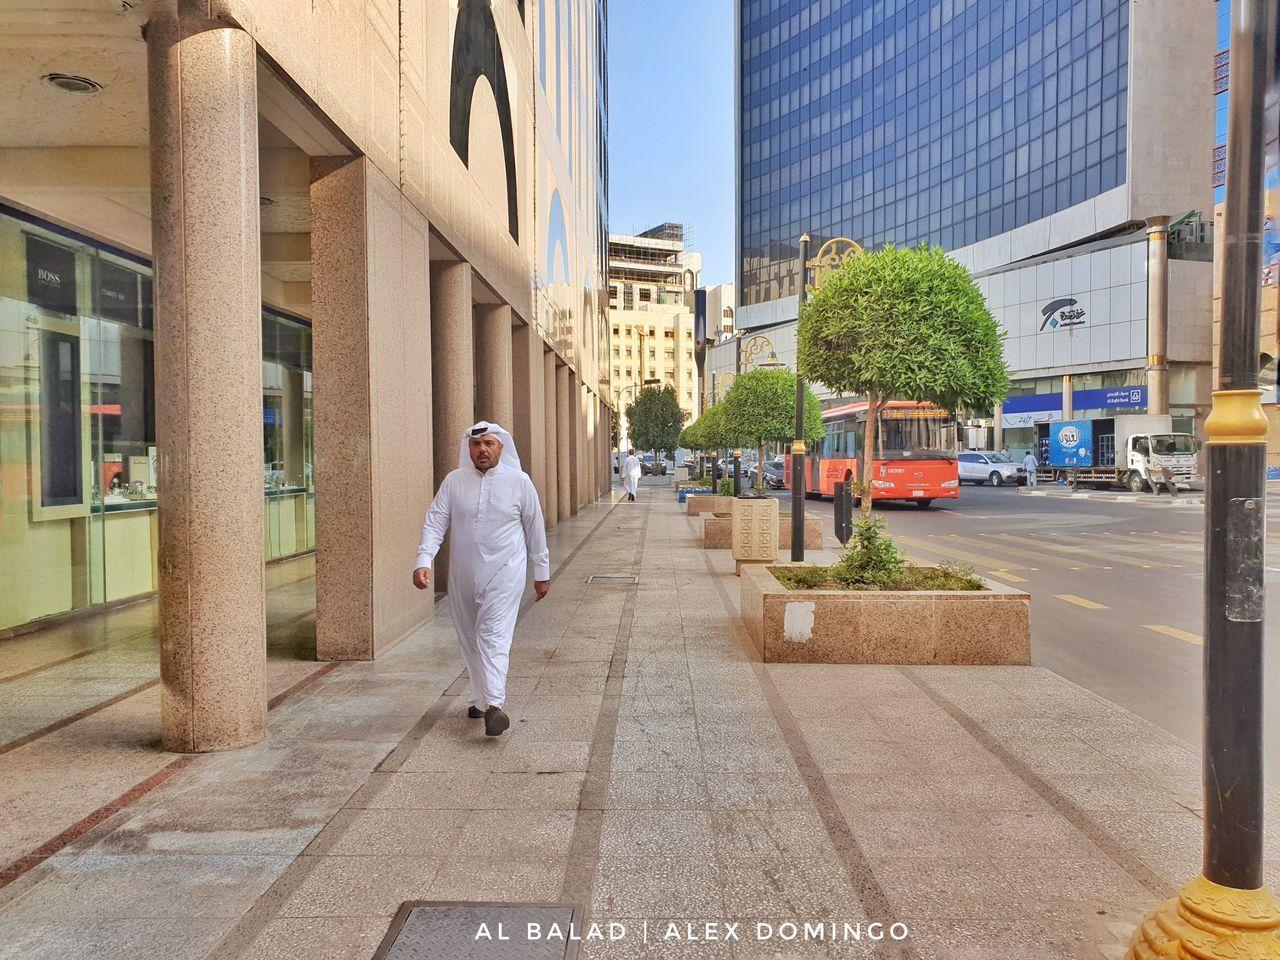 REAR VIEW OF MAN WALKING ON SIDEWALK BY BUILDINGS